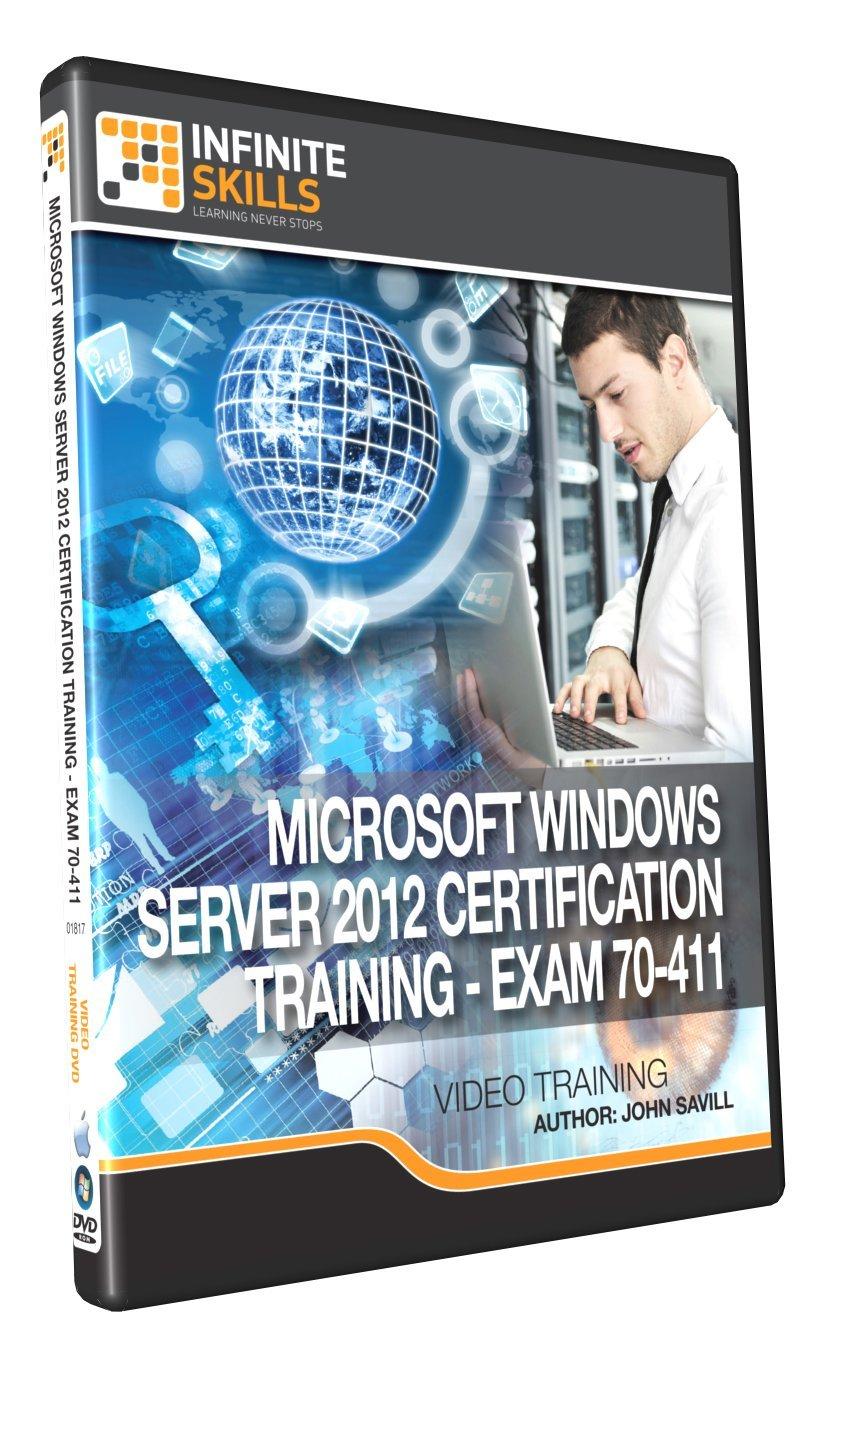 Amazon learning microsoft windows server 2012 certification amazon learning microsoft windows server 2012 certification exam 70 411 training dvd xflitez Image collections